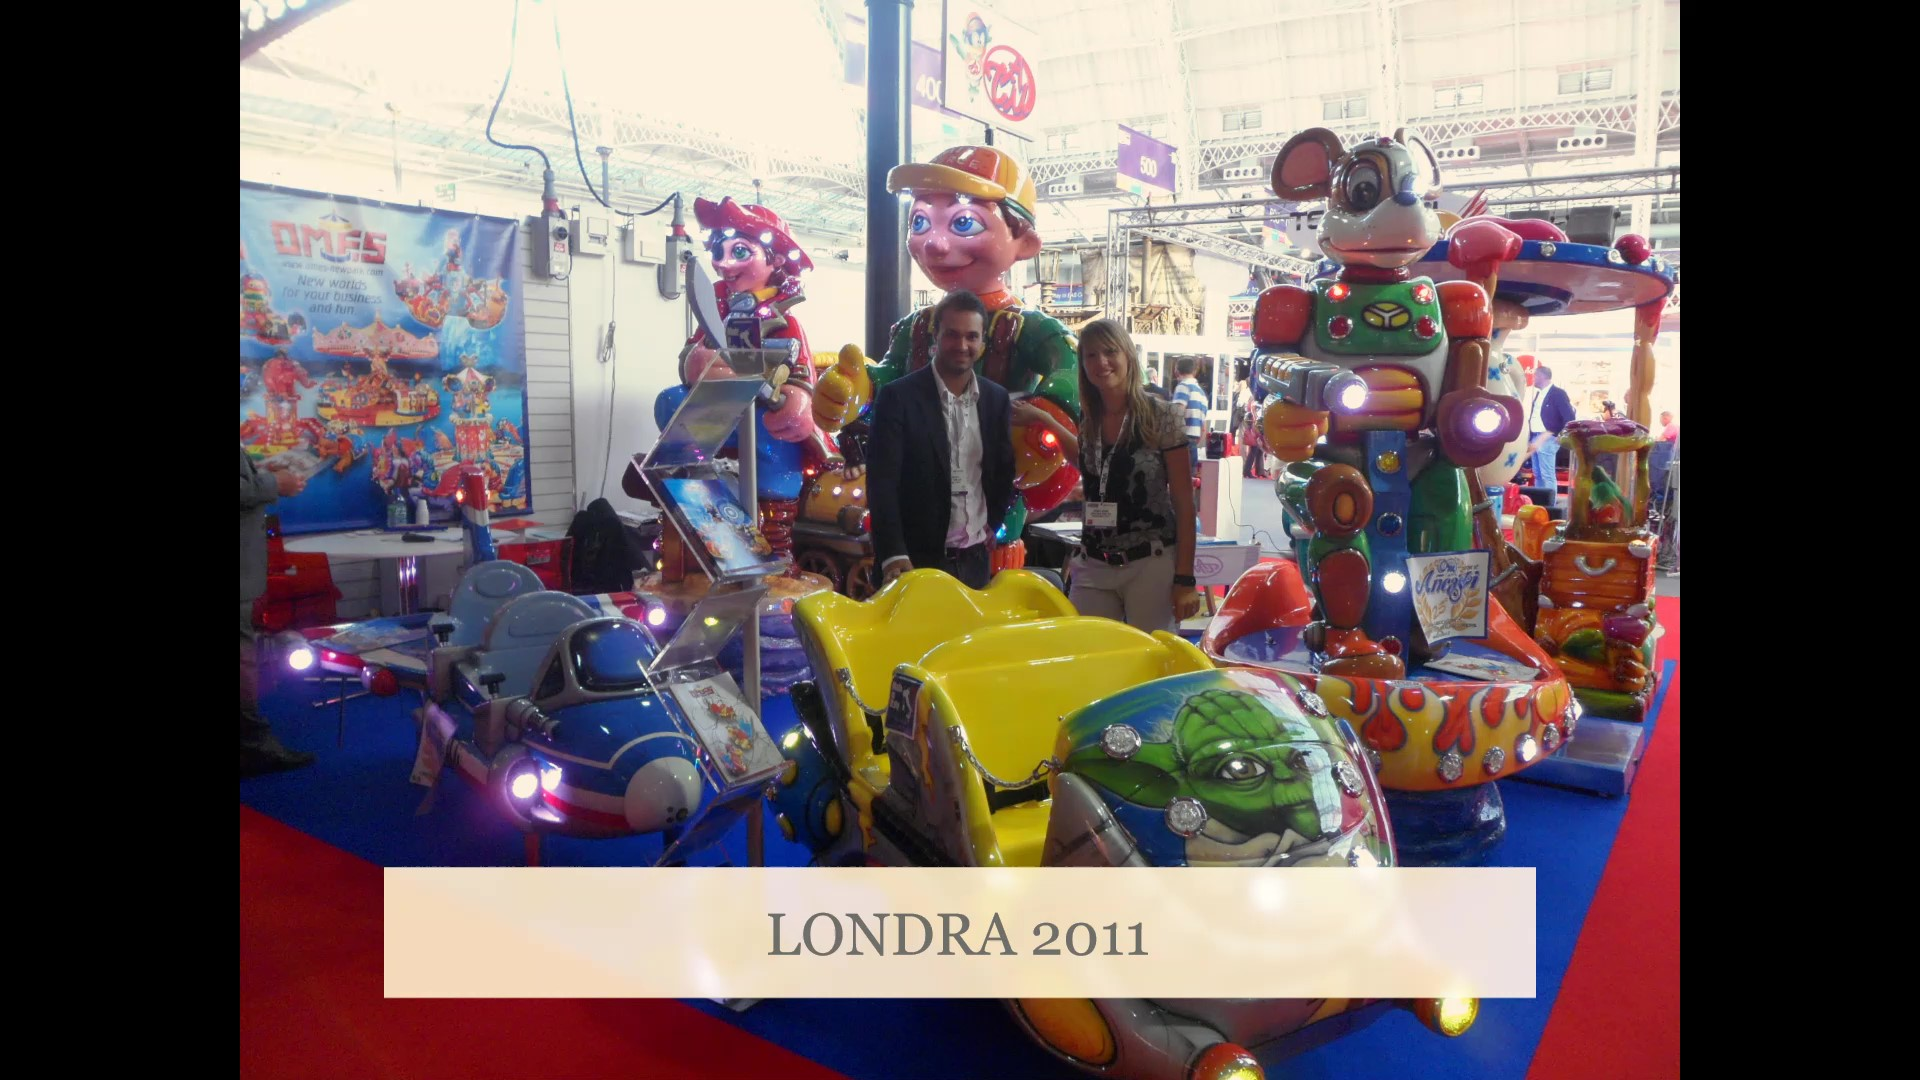 LONDRA 2011